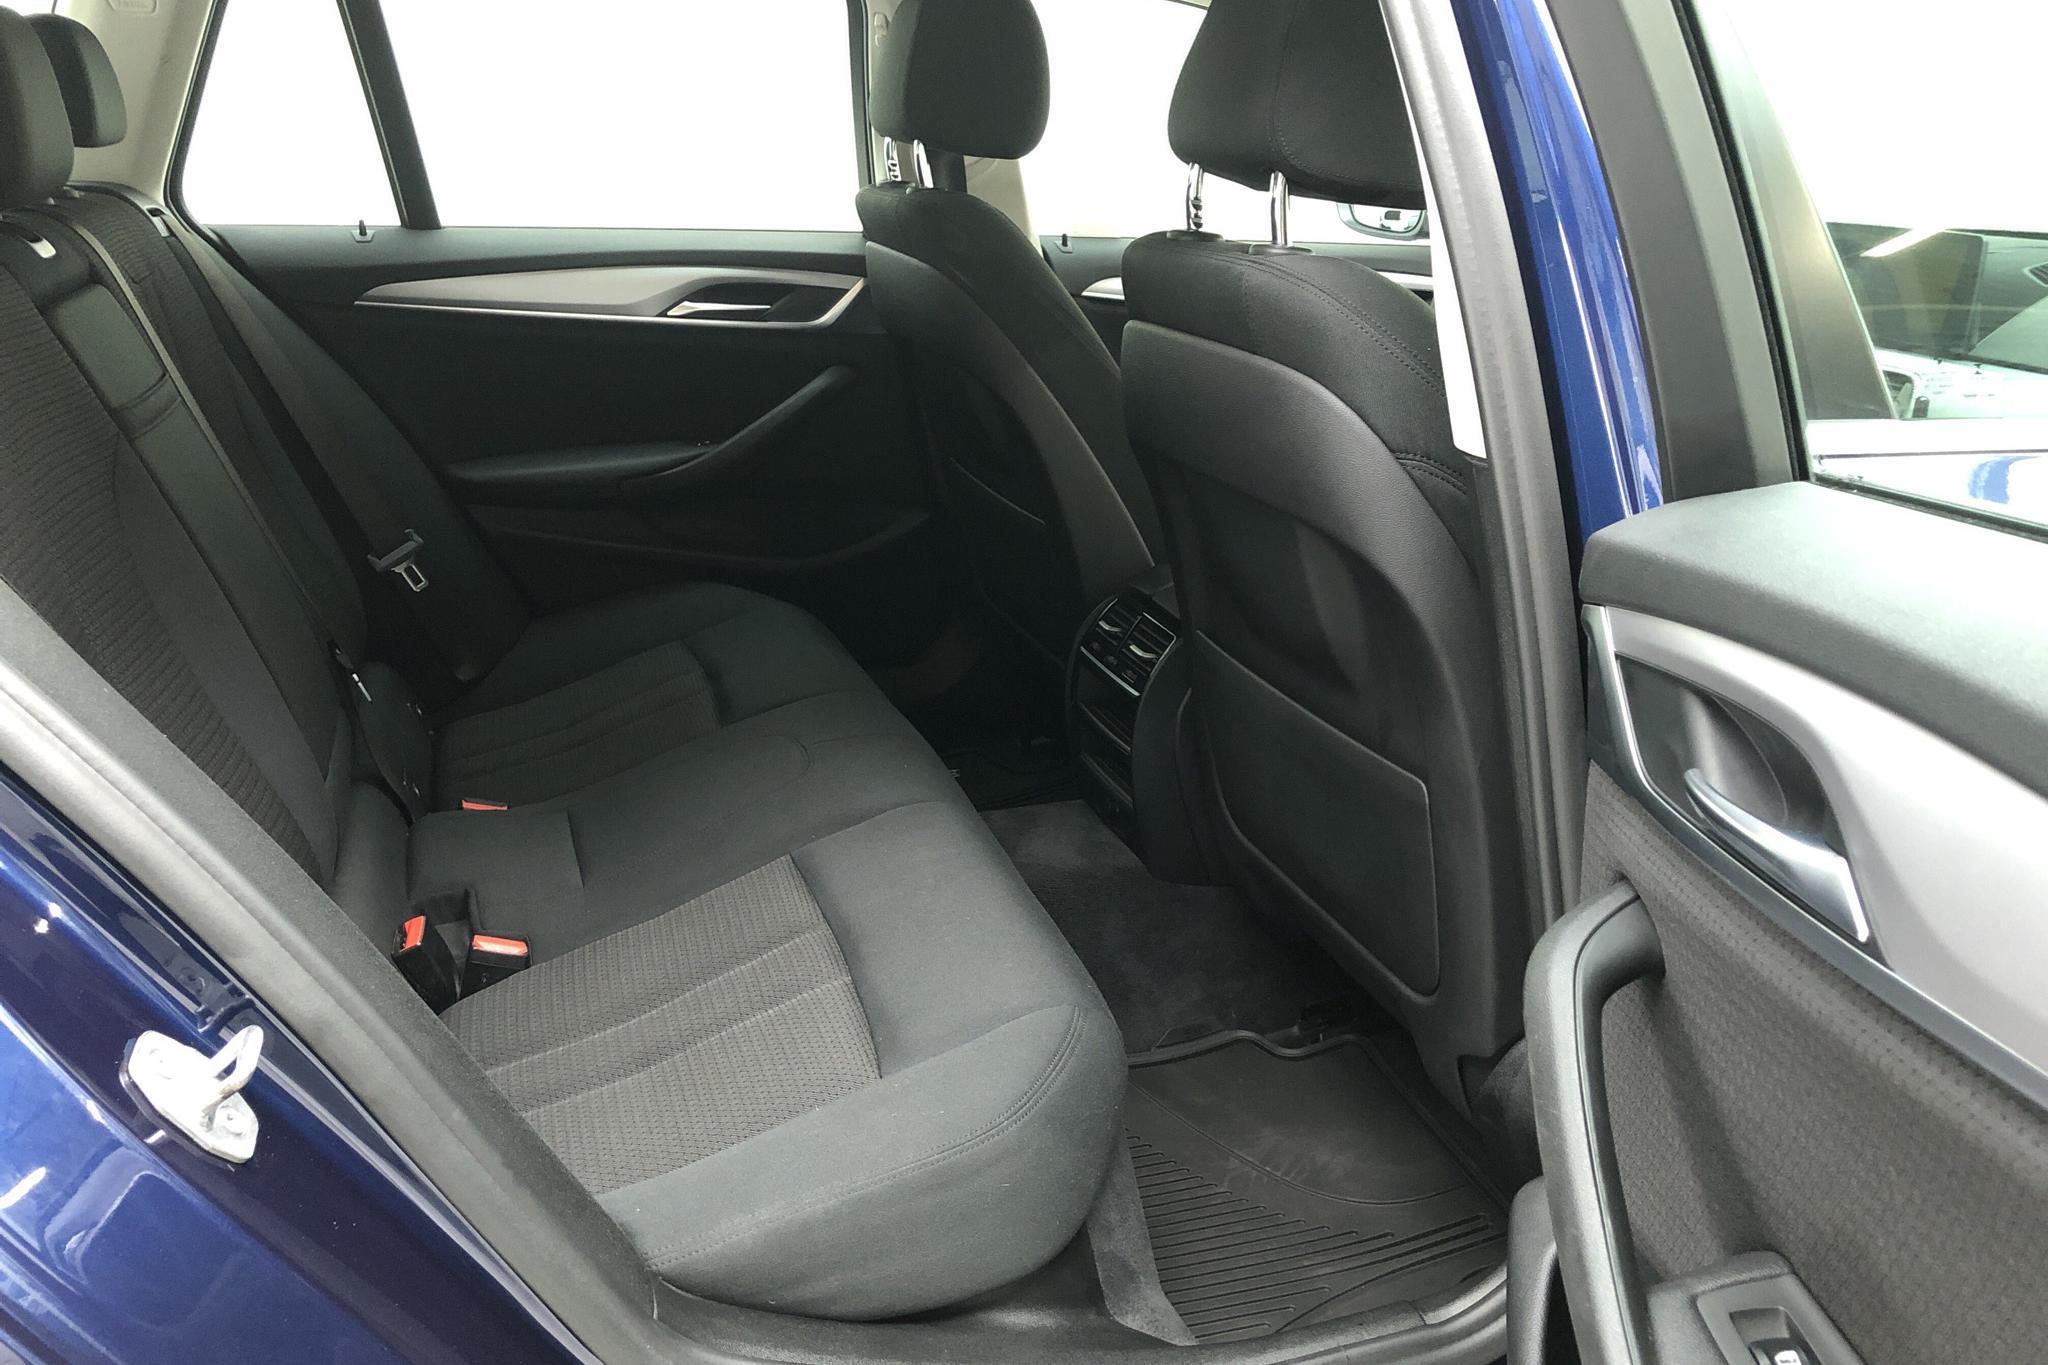 BMW 520d Touring, G31 (190hk) - 149 340 km - Automatic - blue - 2018